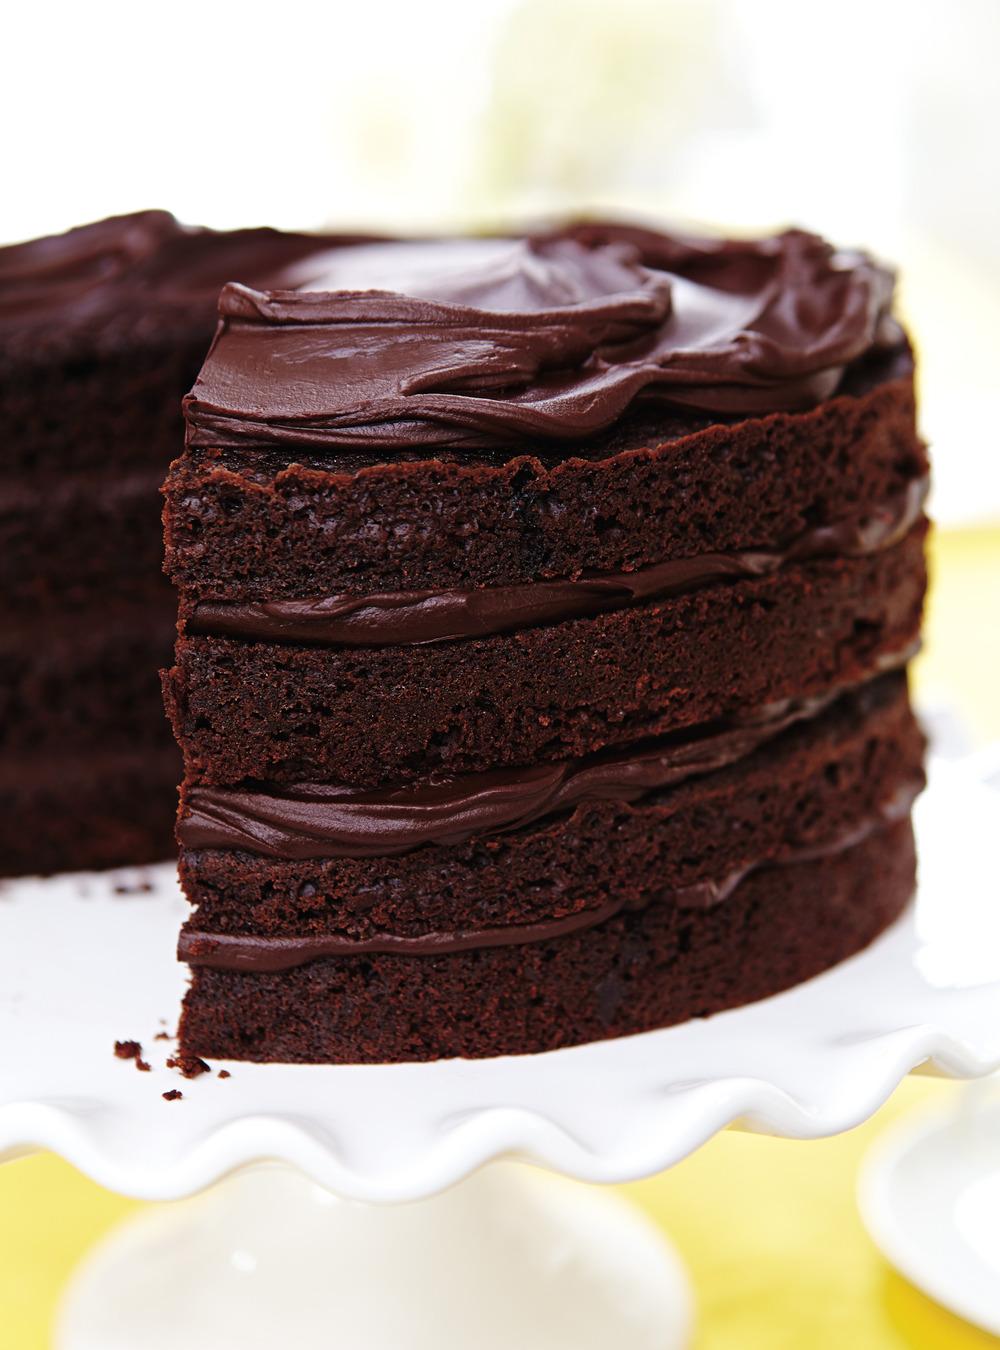 Le meilleur-meilleur gâteau au chocolat | ricardo